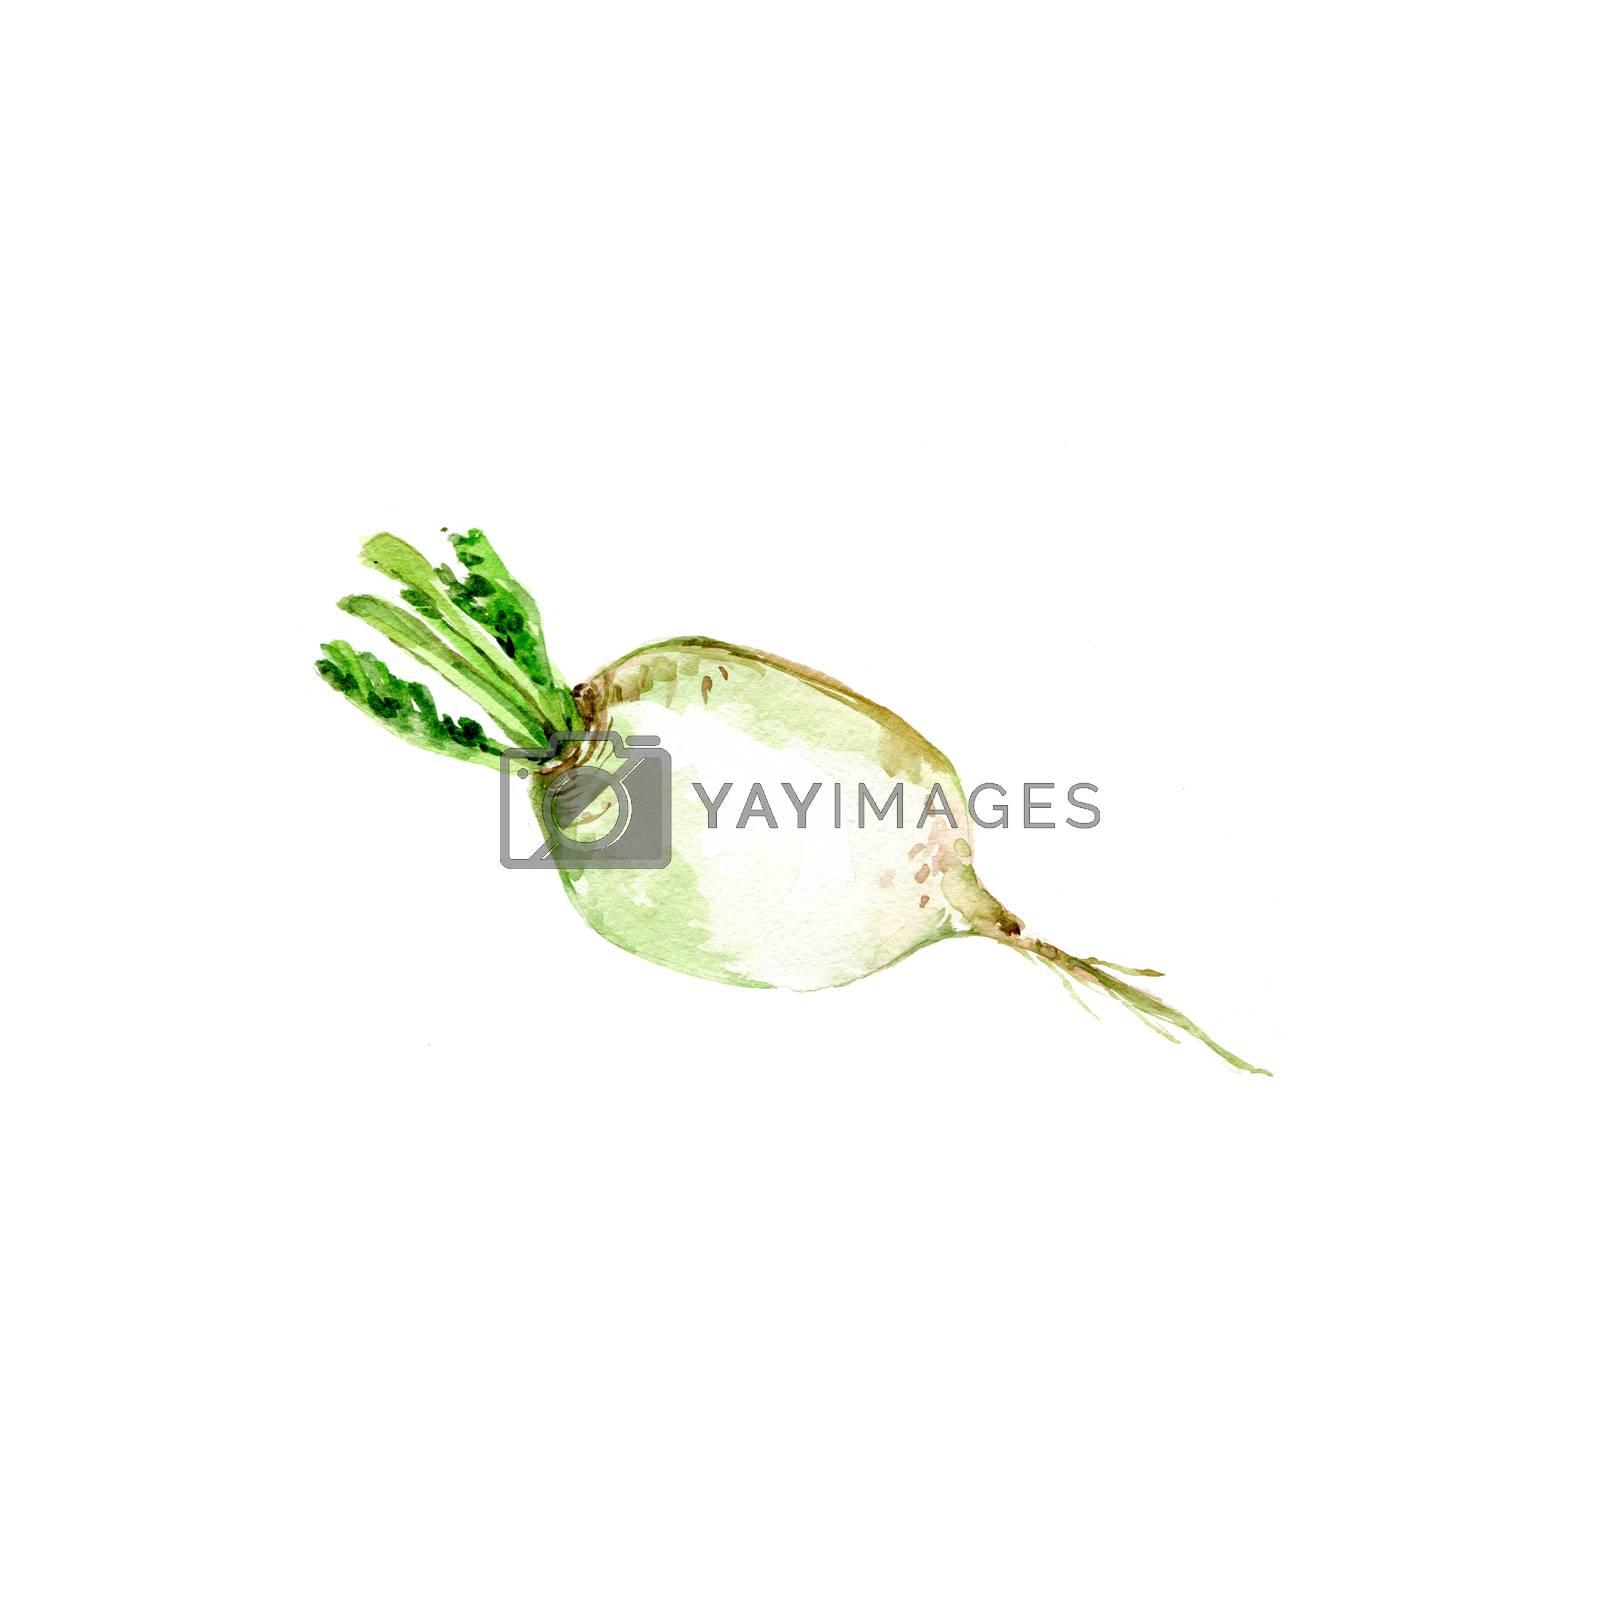 Watercolor Turnip. Hand Drawn Illustration Organic Food Vegetarian Ingredient